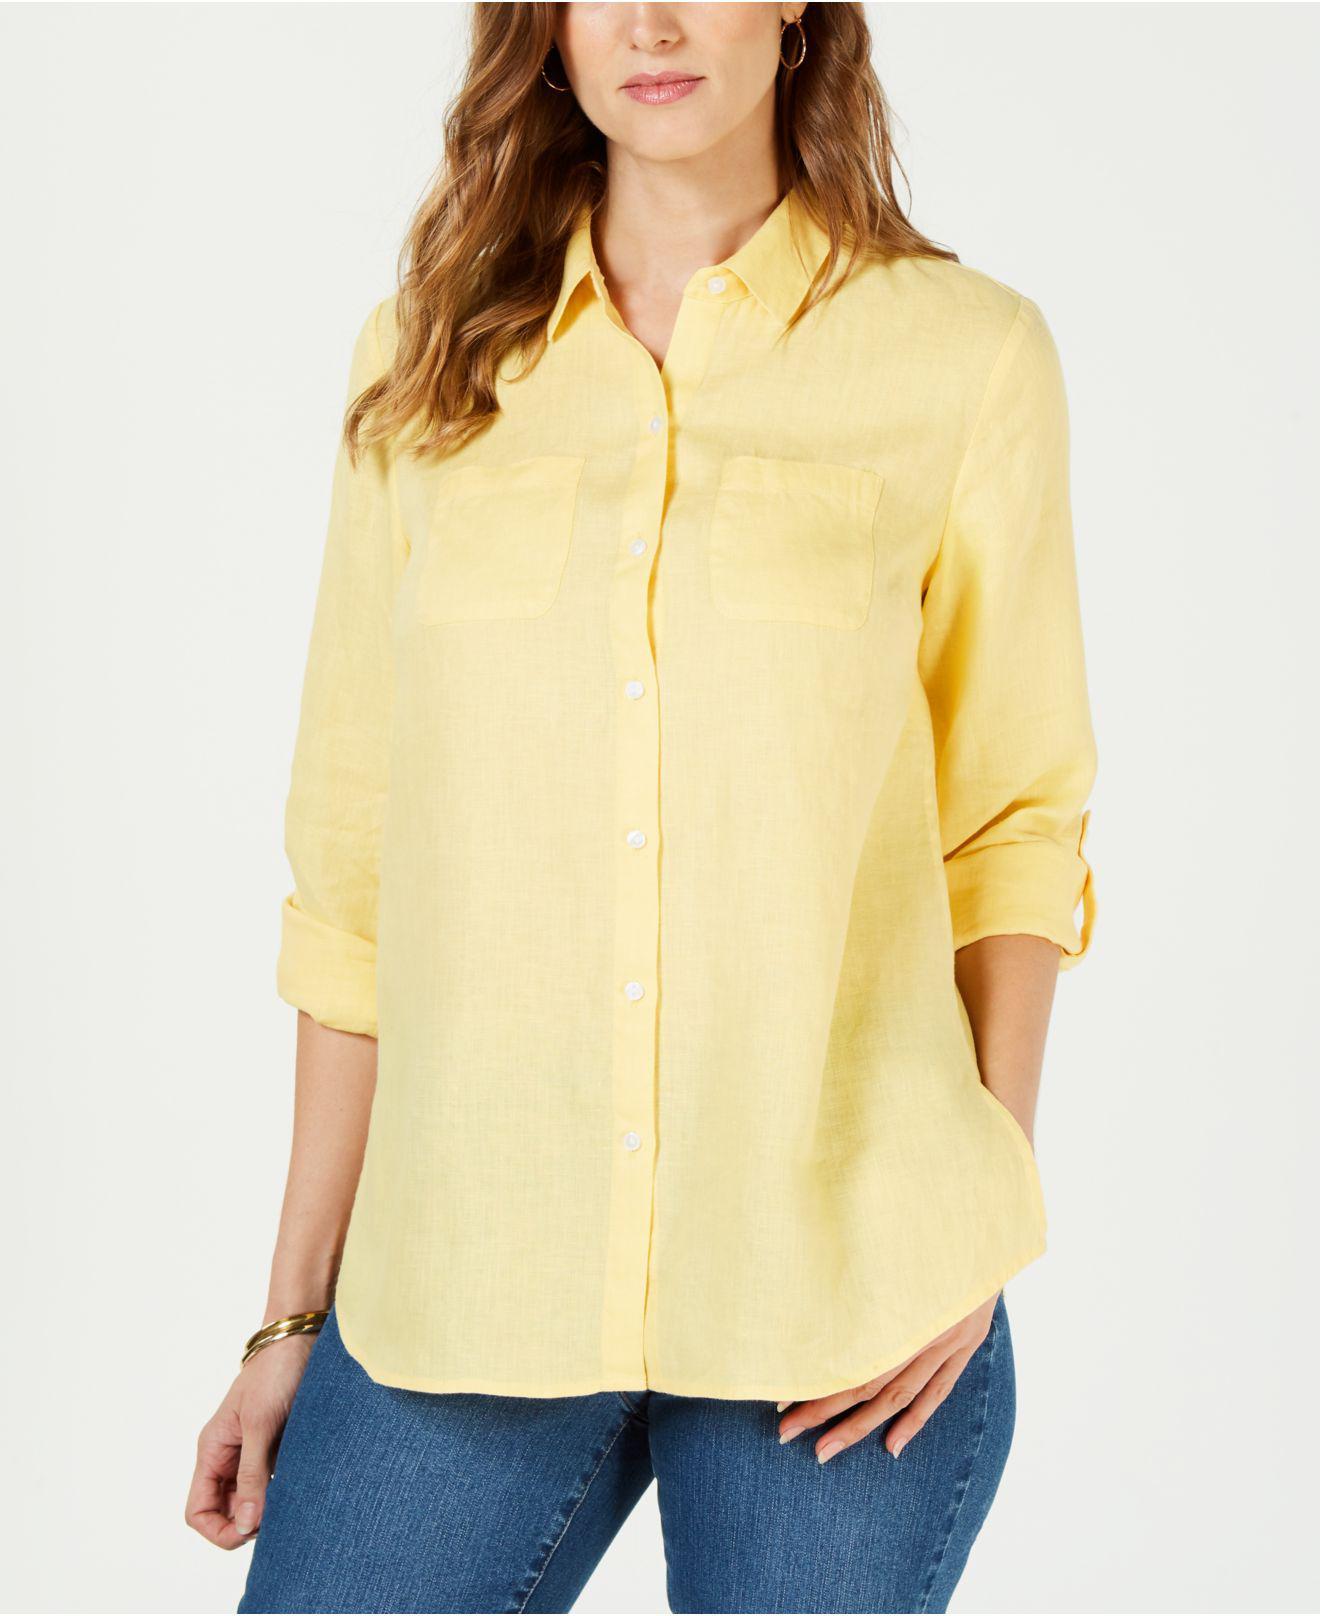 bef11a9f0ea Lyst - Charter Club Petite Linen Button-front Shirt